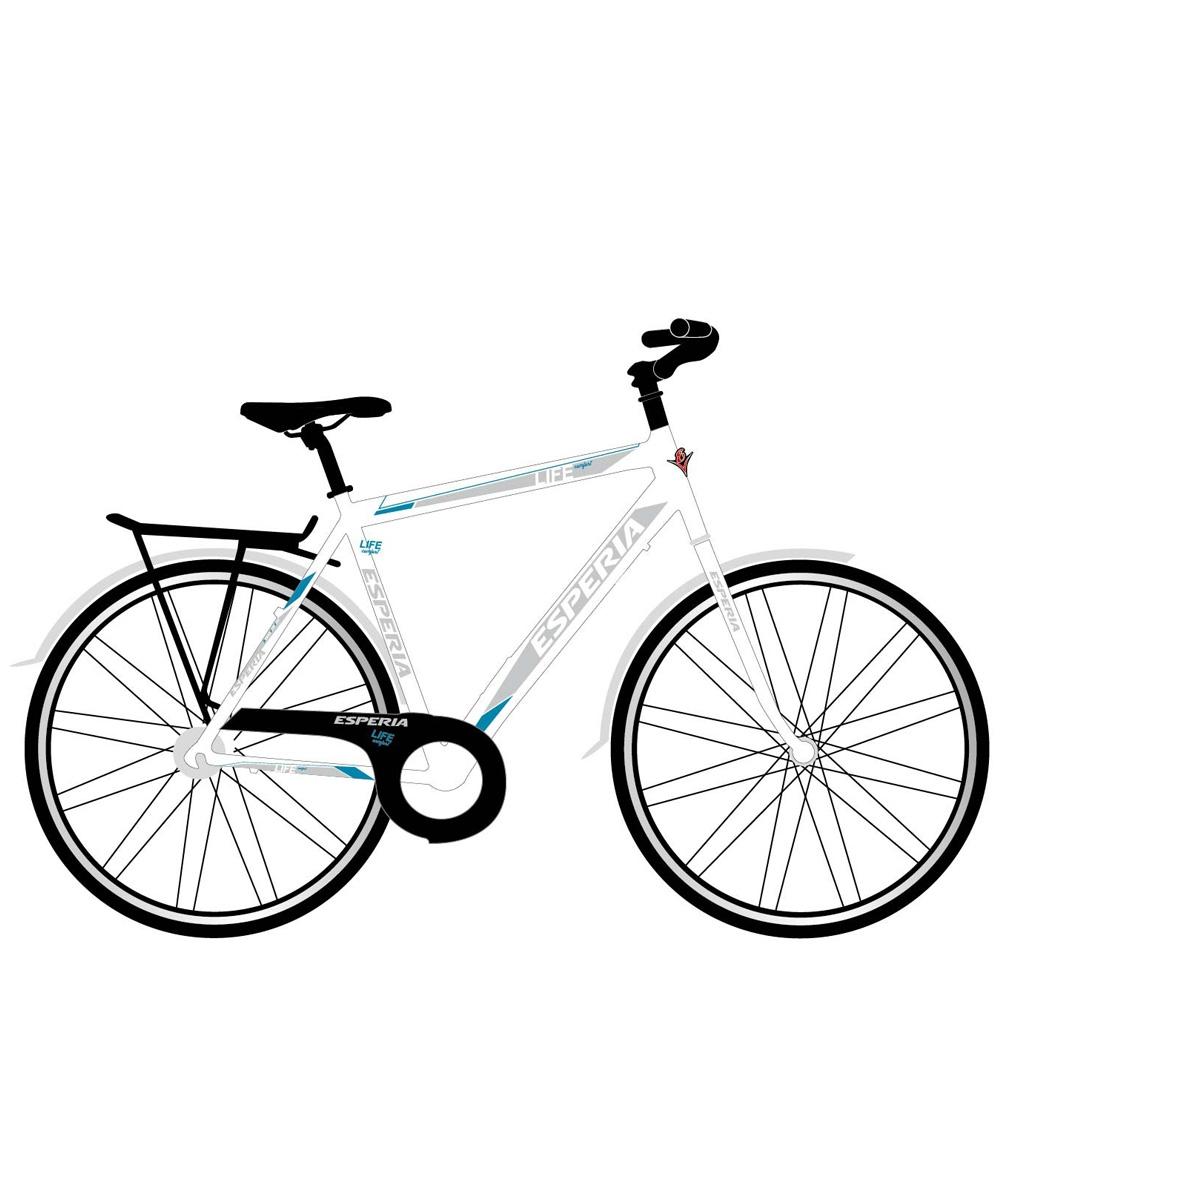 Vélo trekking Esperia Blanc Homme 6250u Life Confort - 54 cm